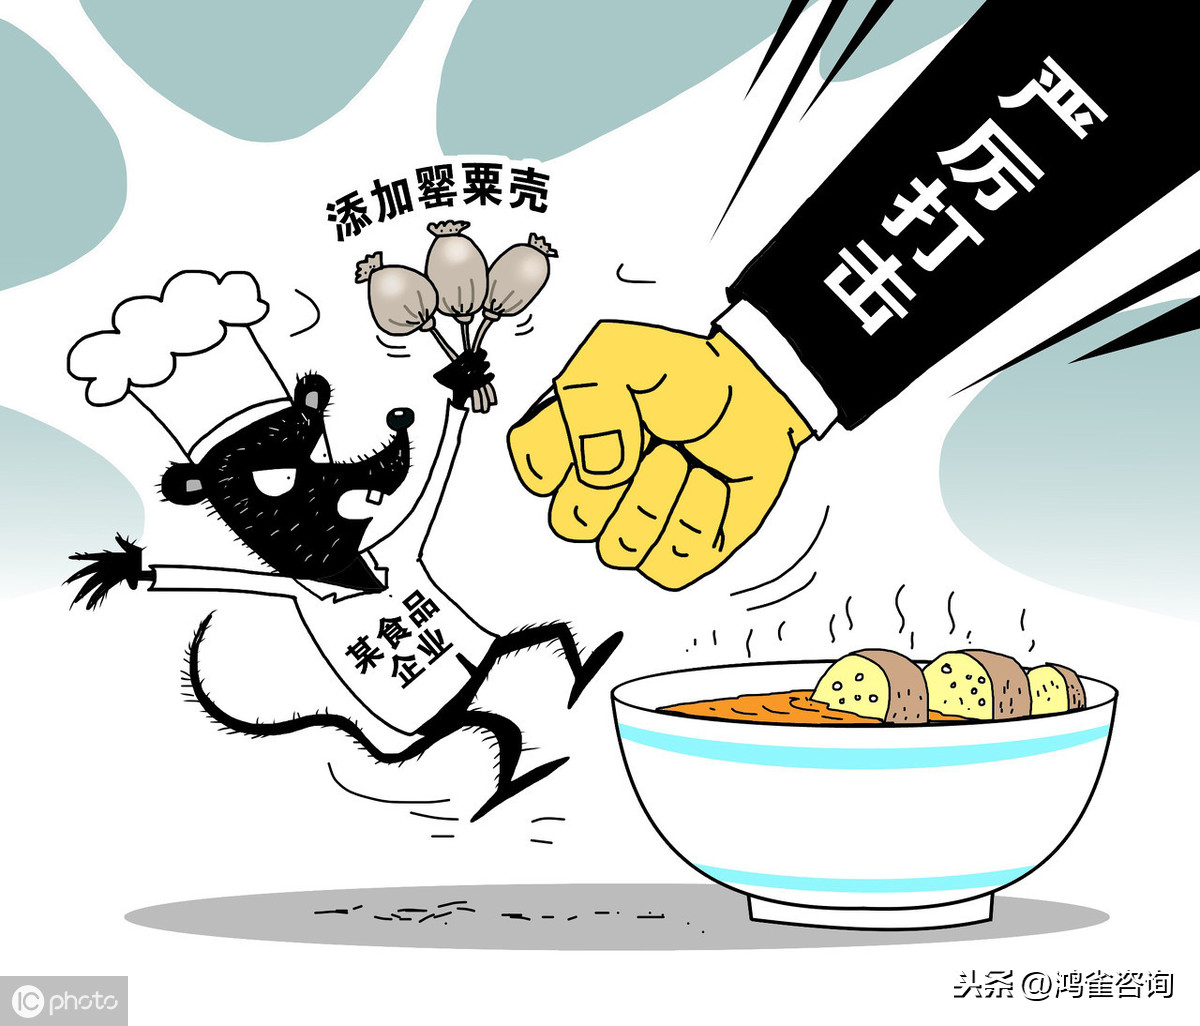 <b>北京食品许可证办理指南</b>